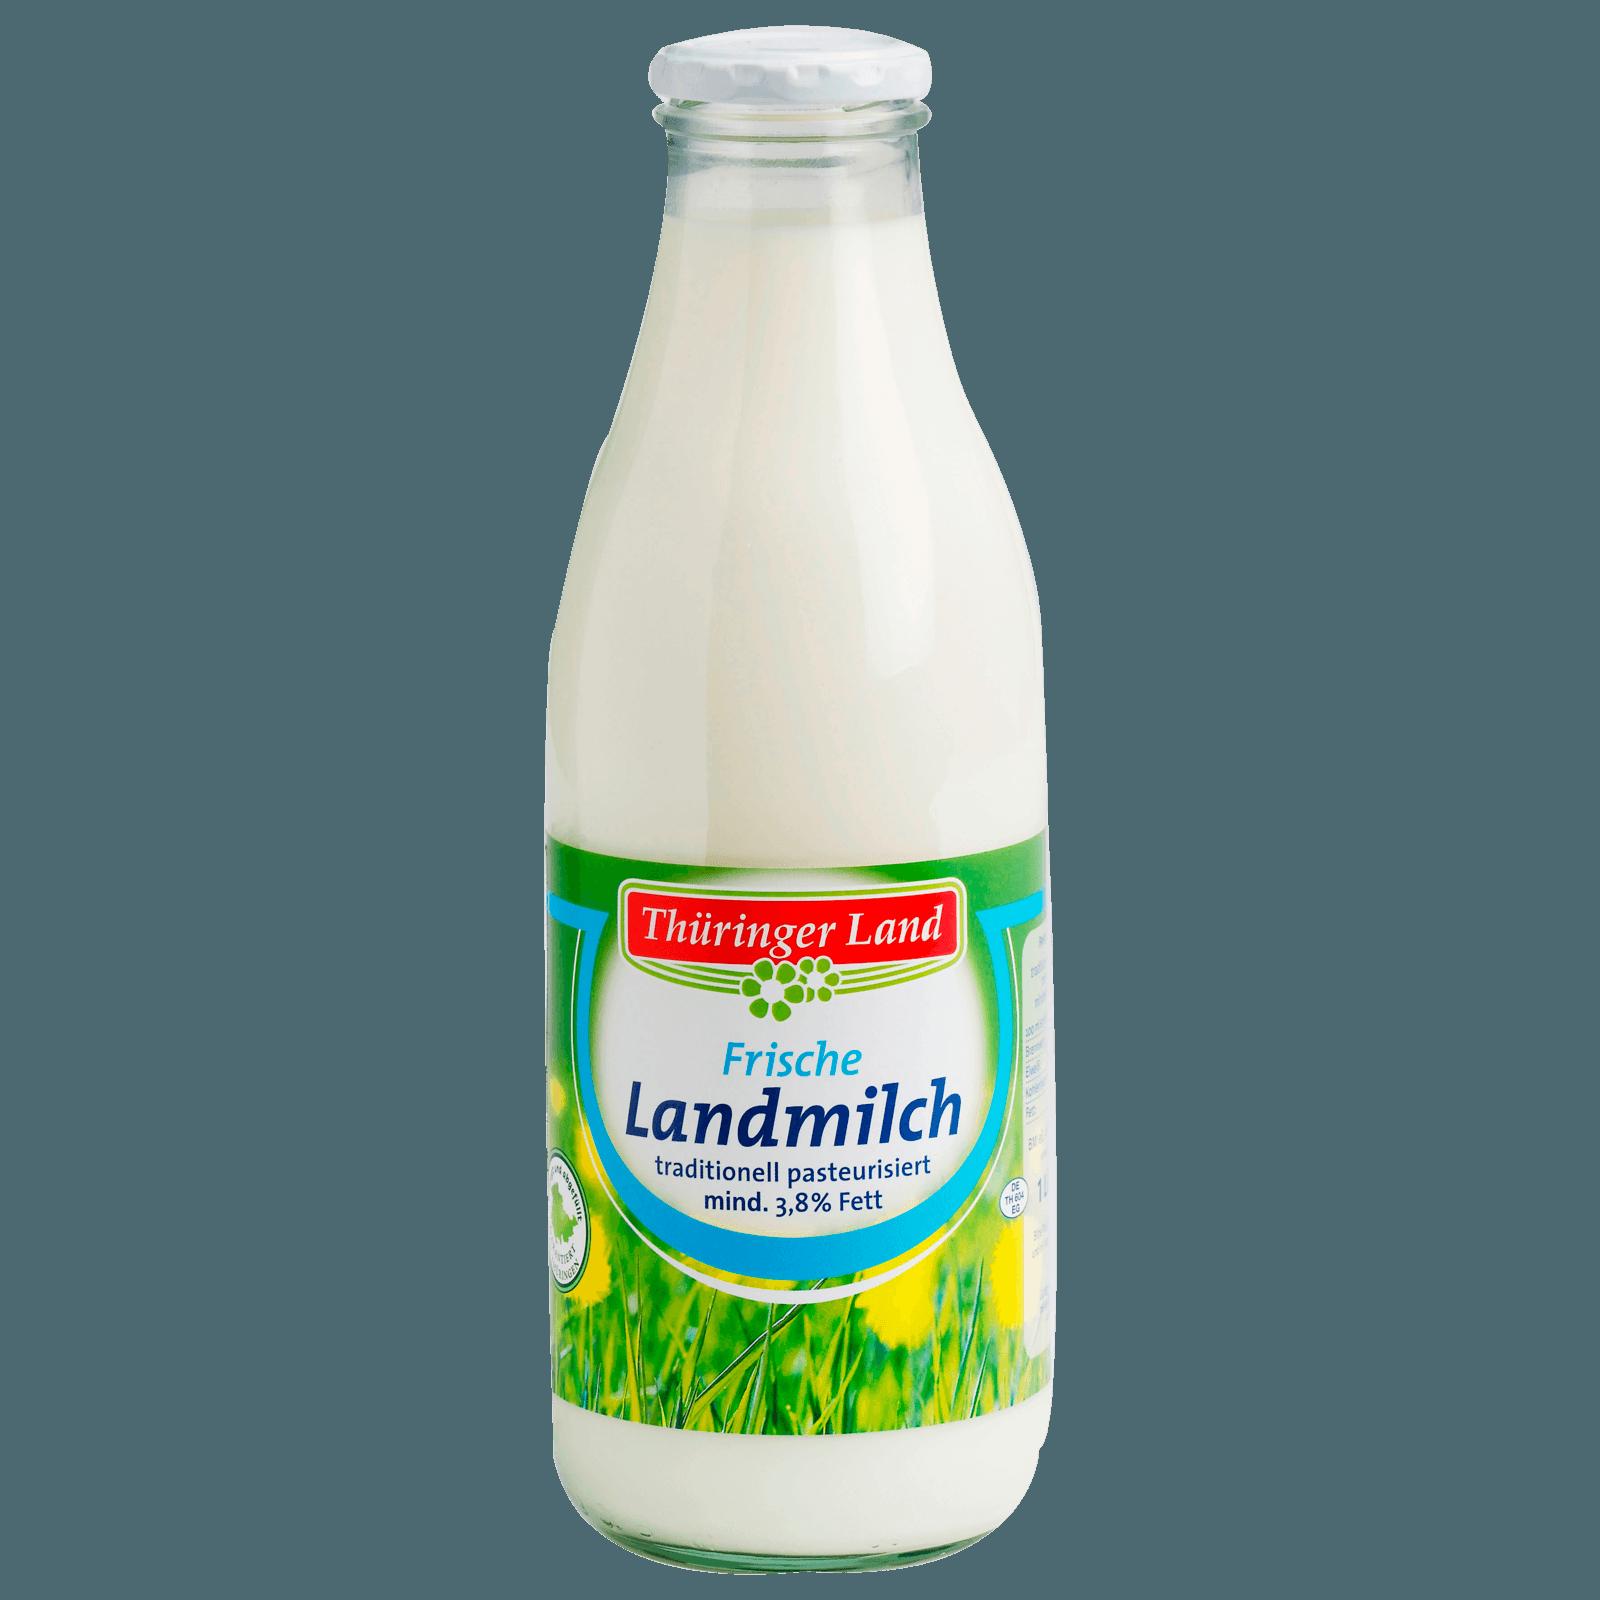 Thüringer Land Trinkmilch 3,8% 1l